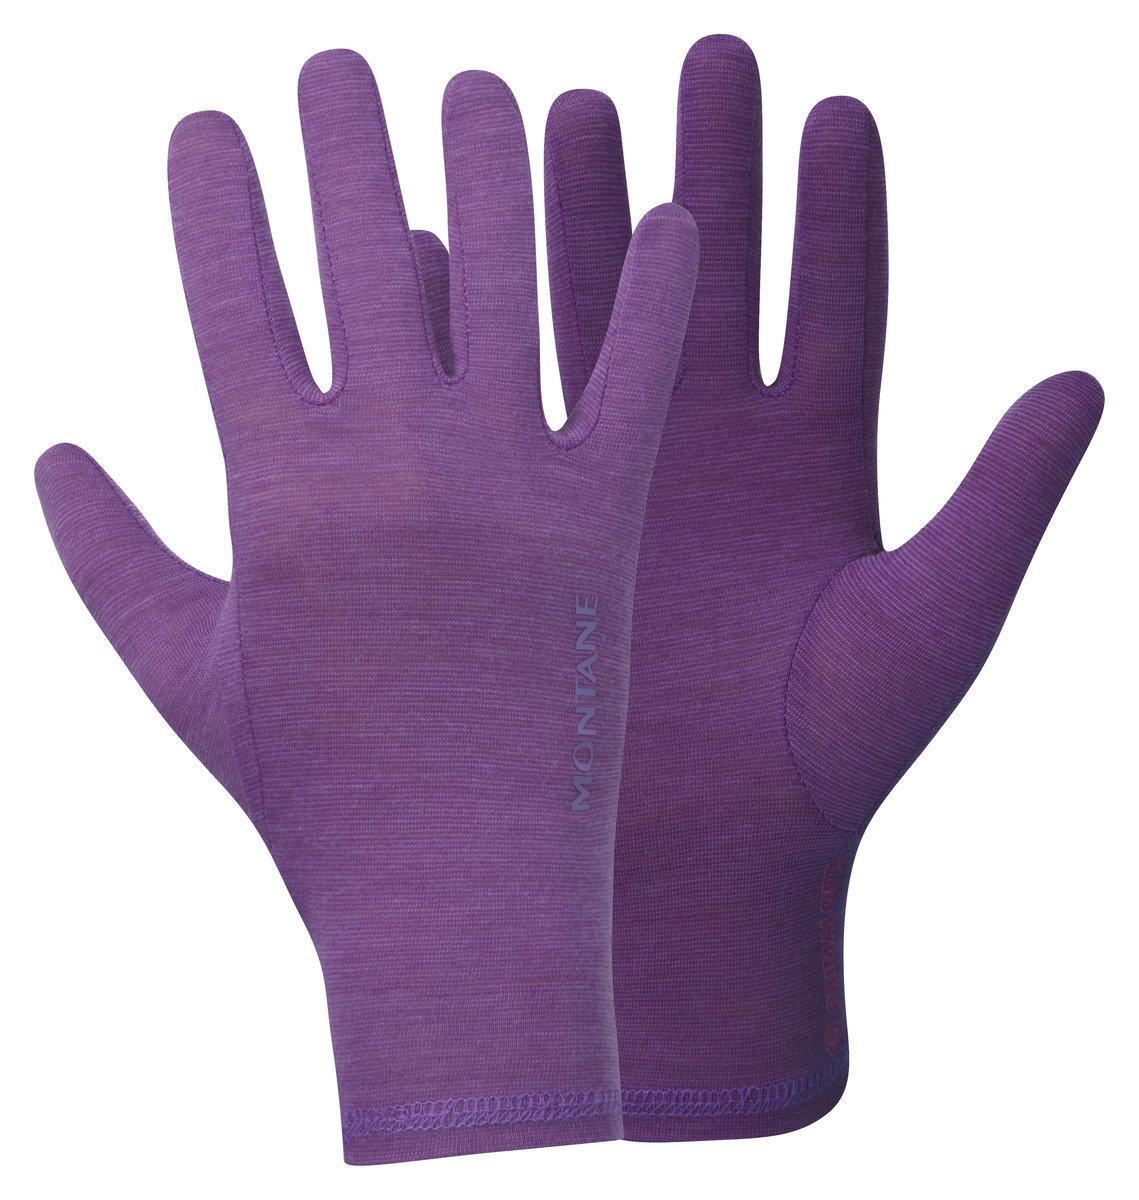 英國女裝 Primino® 保暖手套 - Fem Primino 140 Glove Dahlia EW UK10